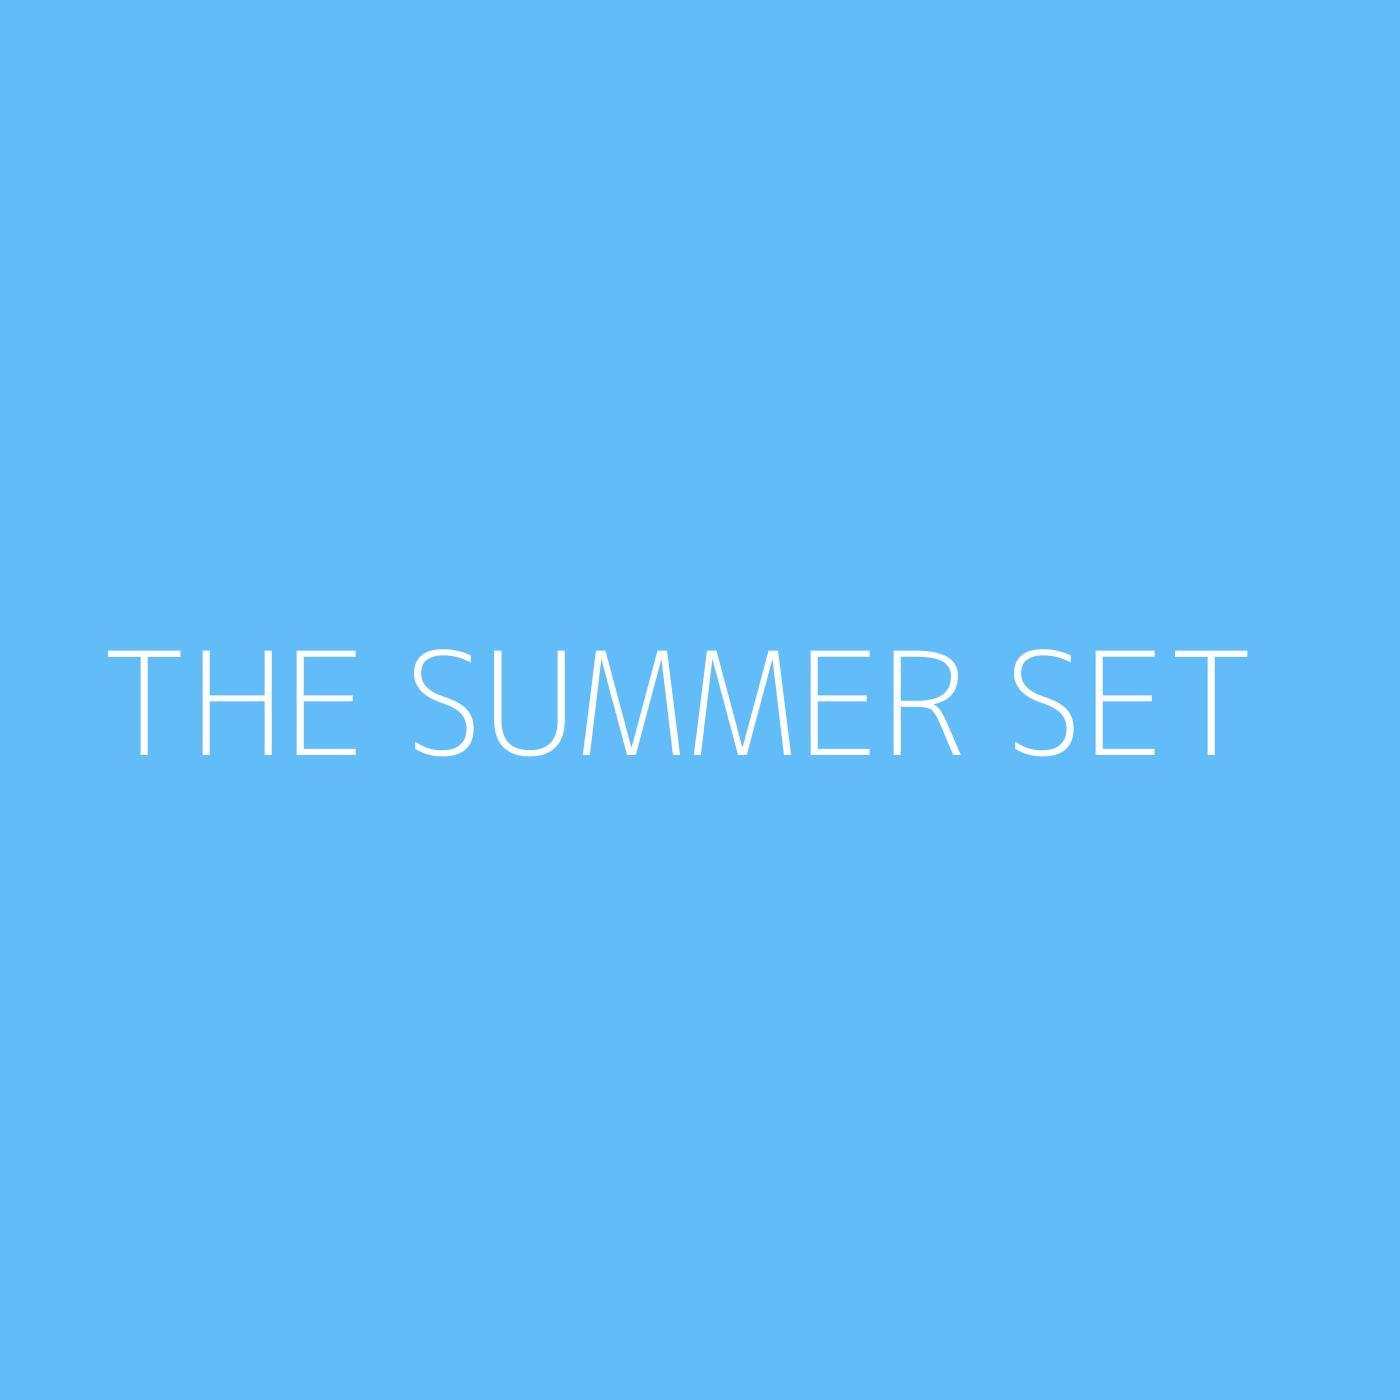 The Summer Set Playlist Artwork